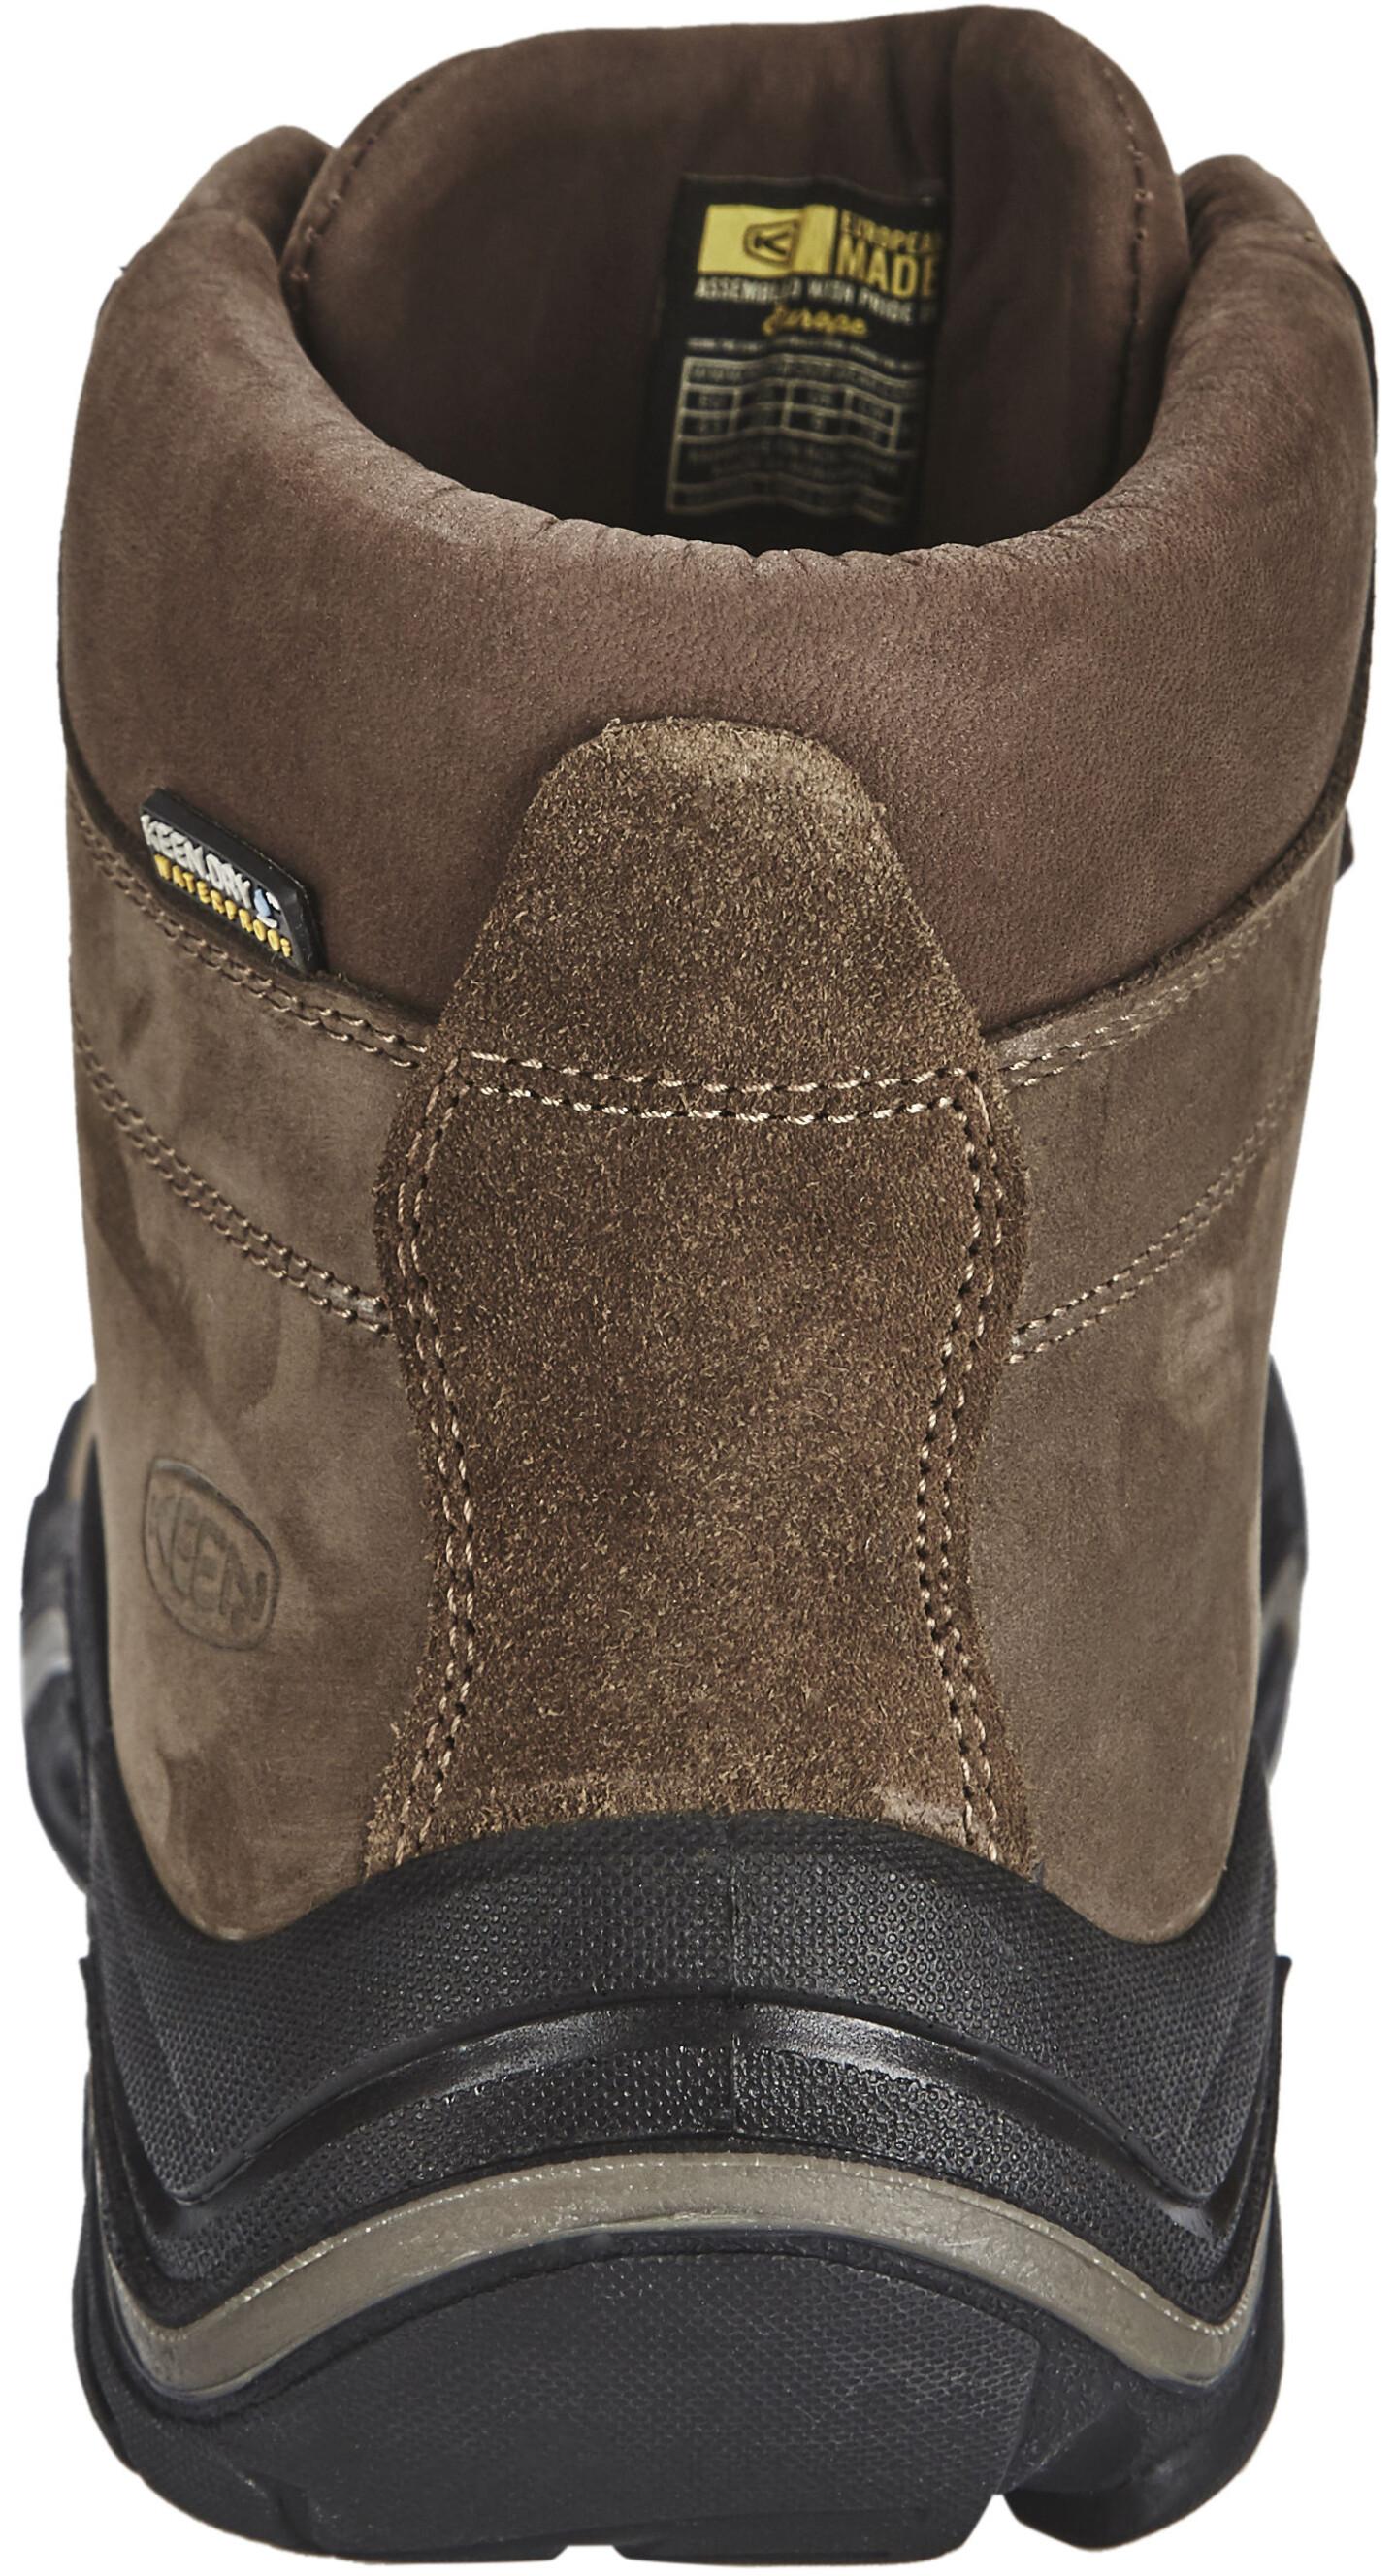 553e2075bb7 Keen Feldberg WP - Chaussures Homme - marron sur CAMPZ !